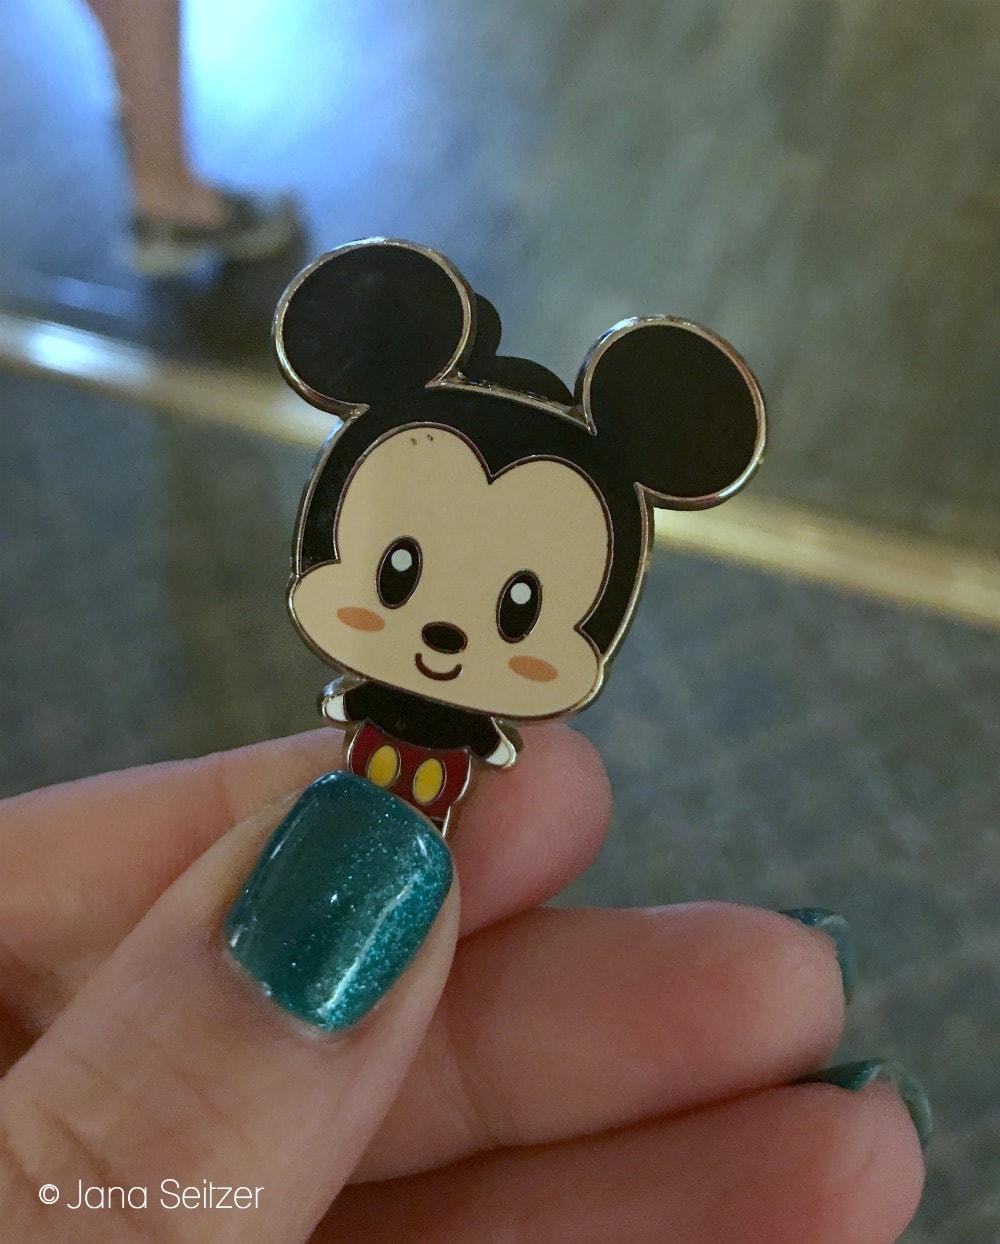 Beginner's Guide To Pin Trading at Disney World: Disney Pin Trading